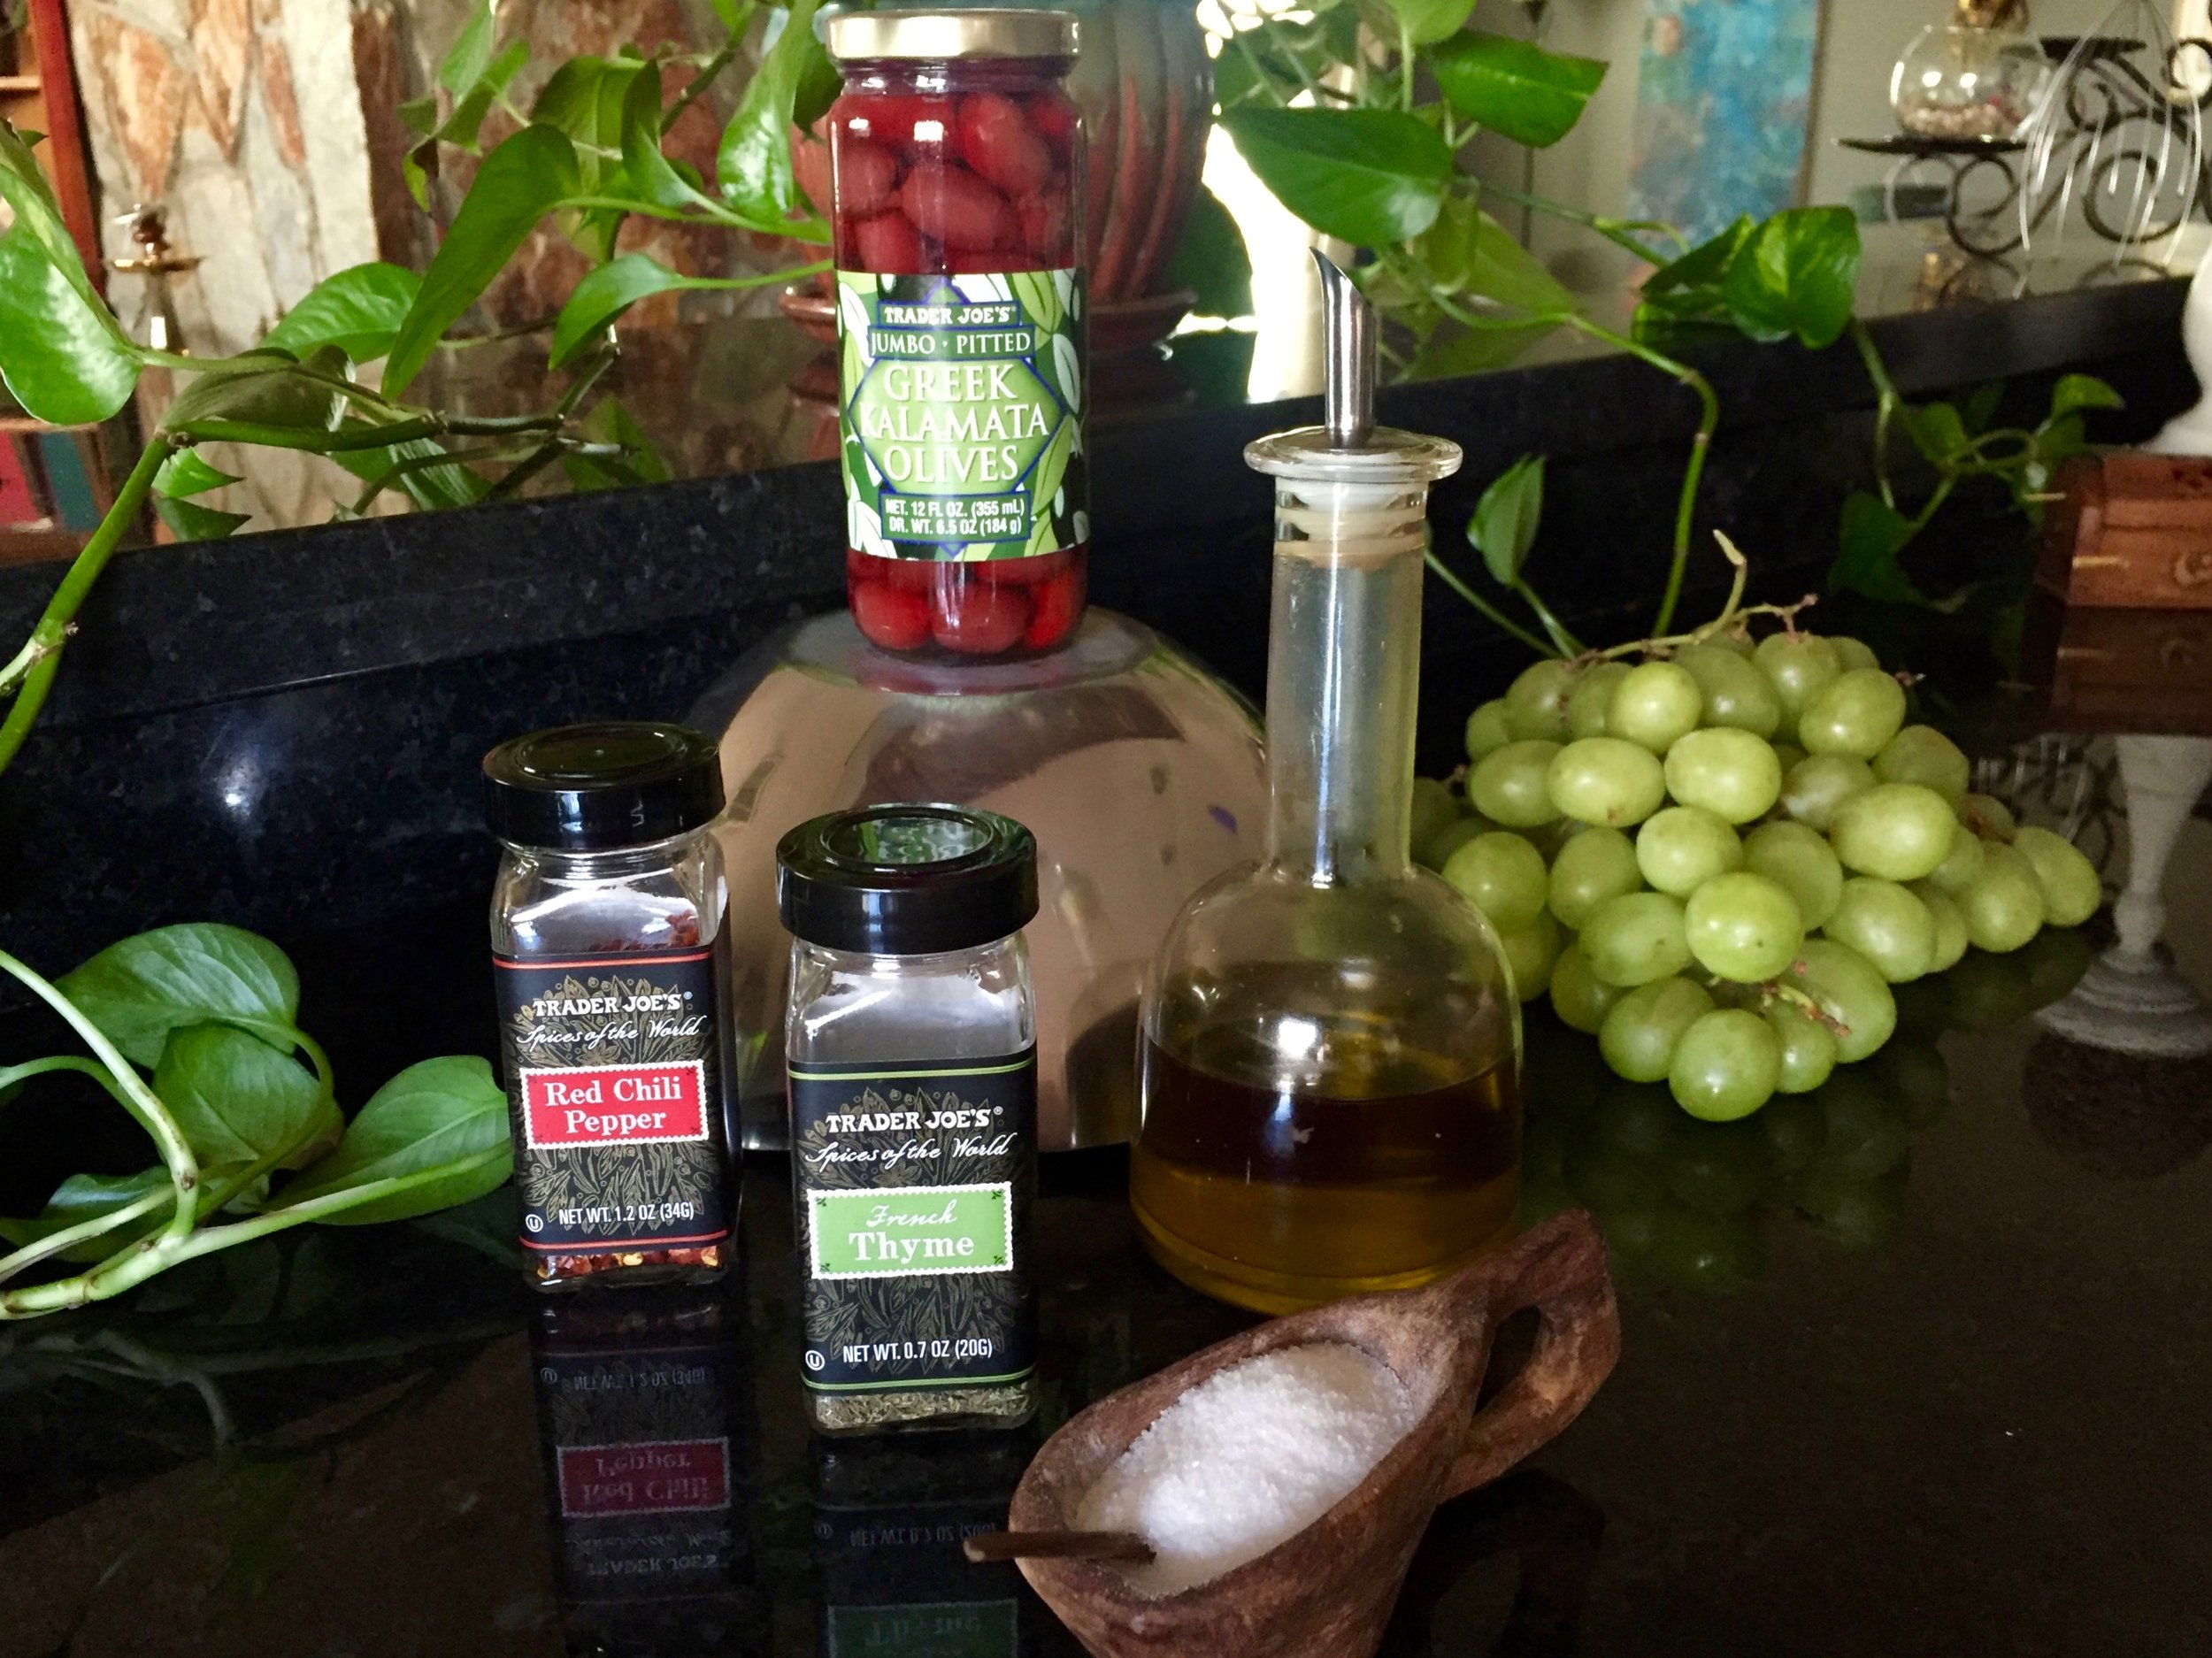 Setup : kalamata olives, green grapes, olive oil, salt, thyme, red chili pepper flakes